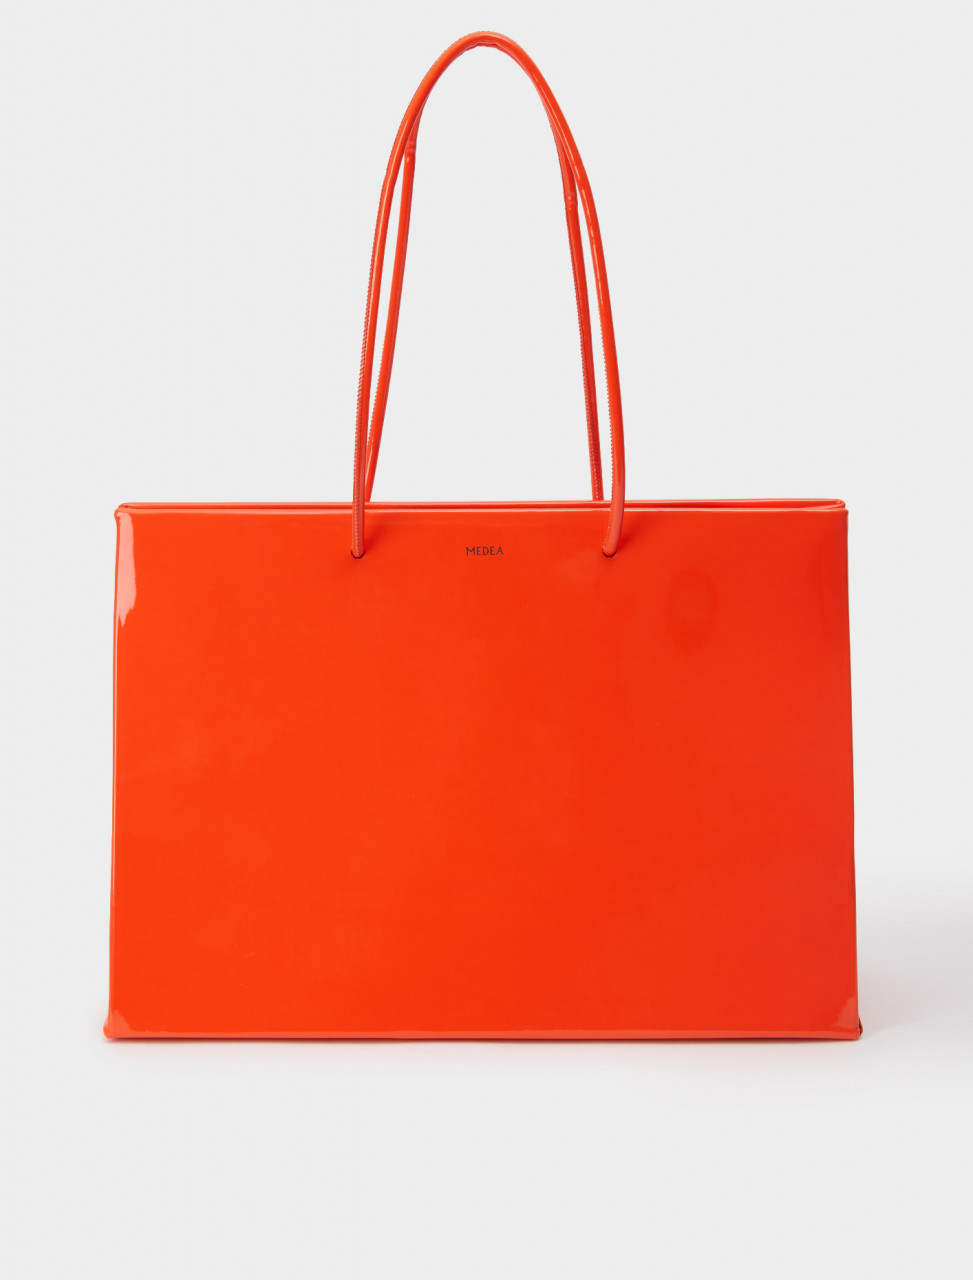 326-20SMEBO048 MEDEA DIECI VINYL SHOPPING BAG SCARLET